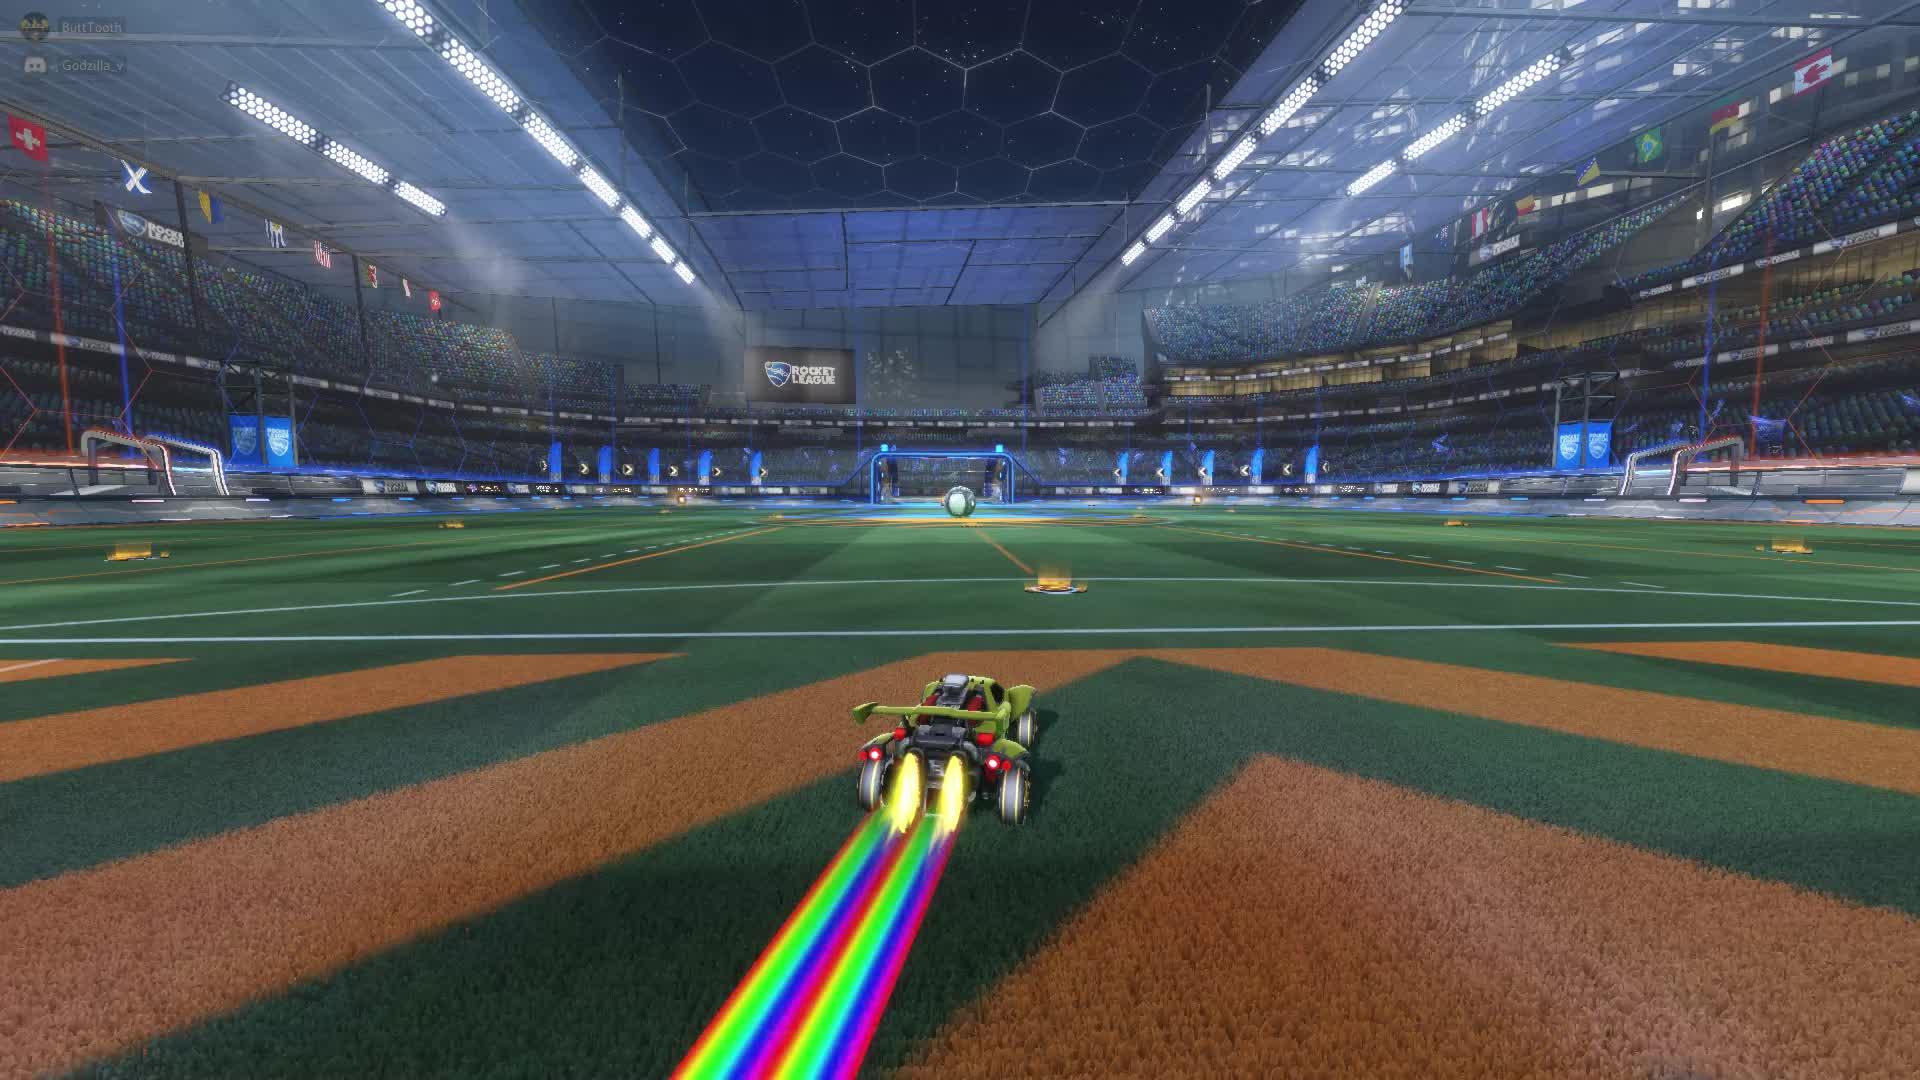 rocket league, rocketleague, Rocket League GIFs